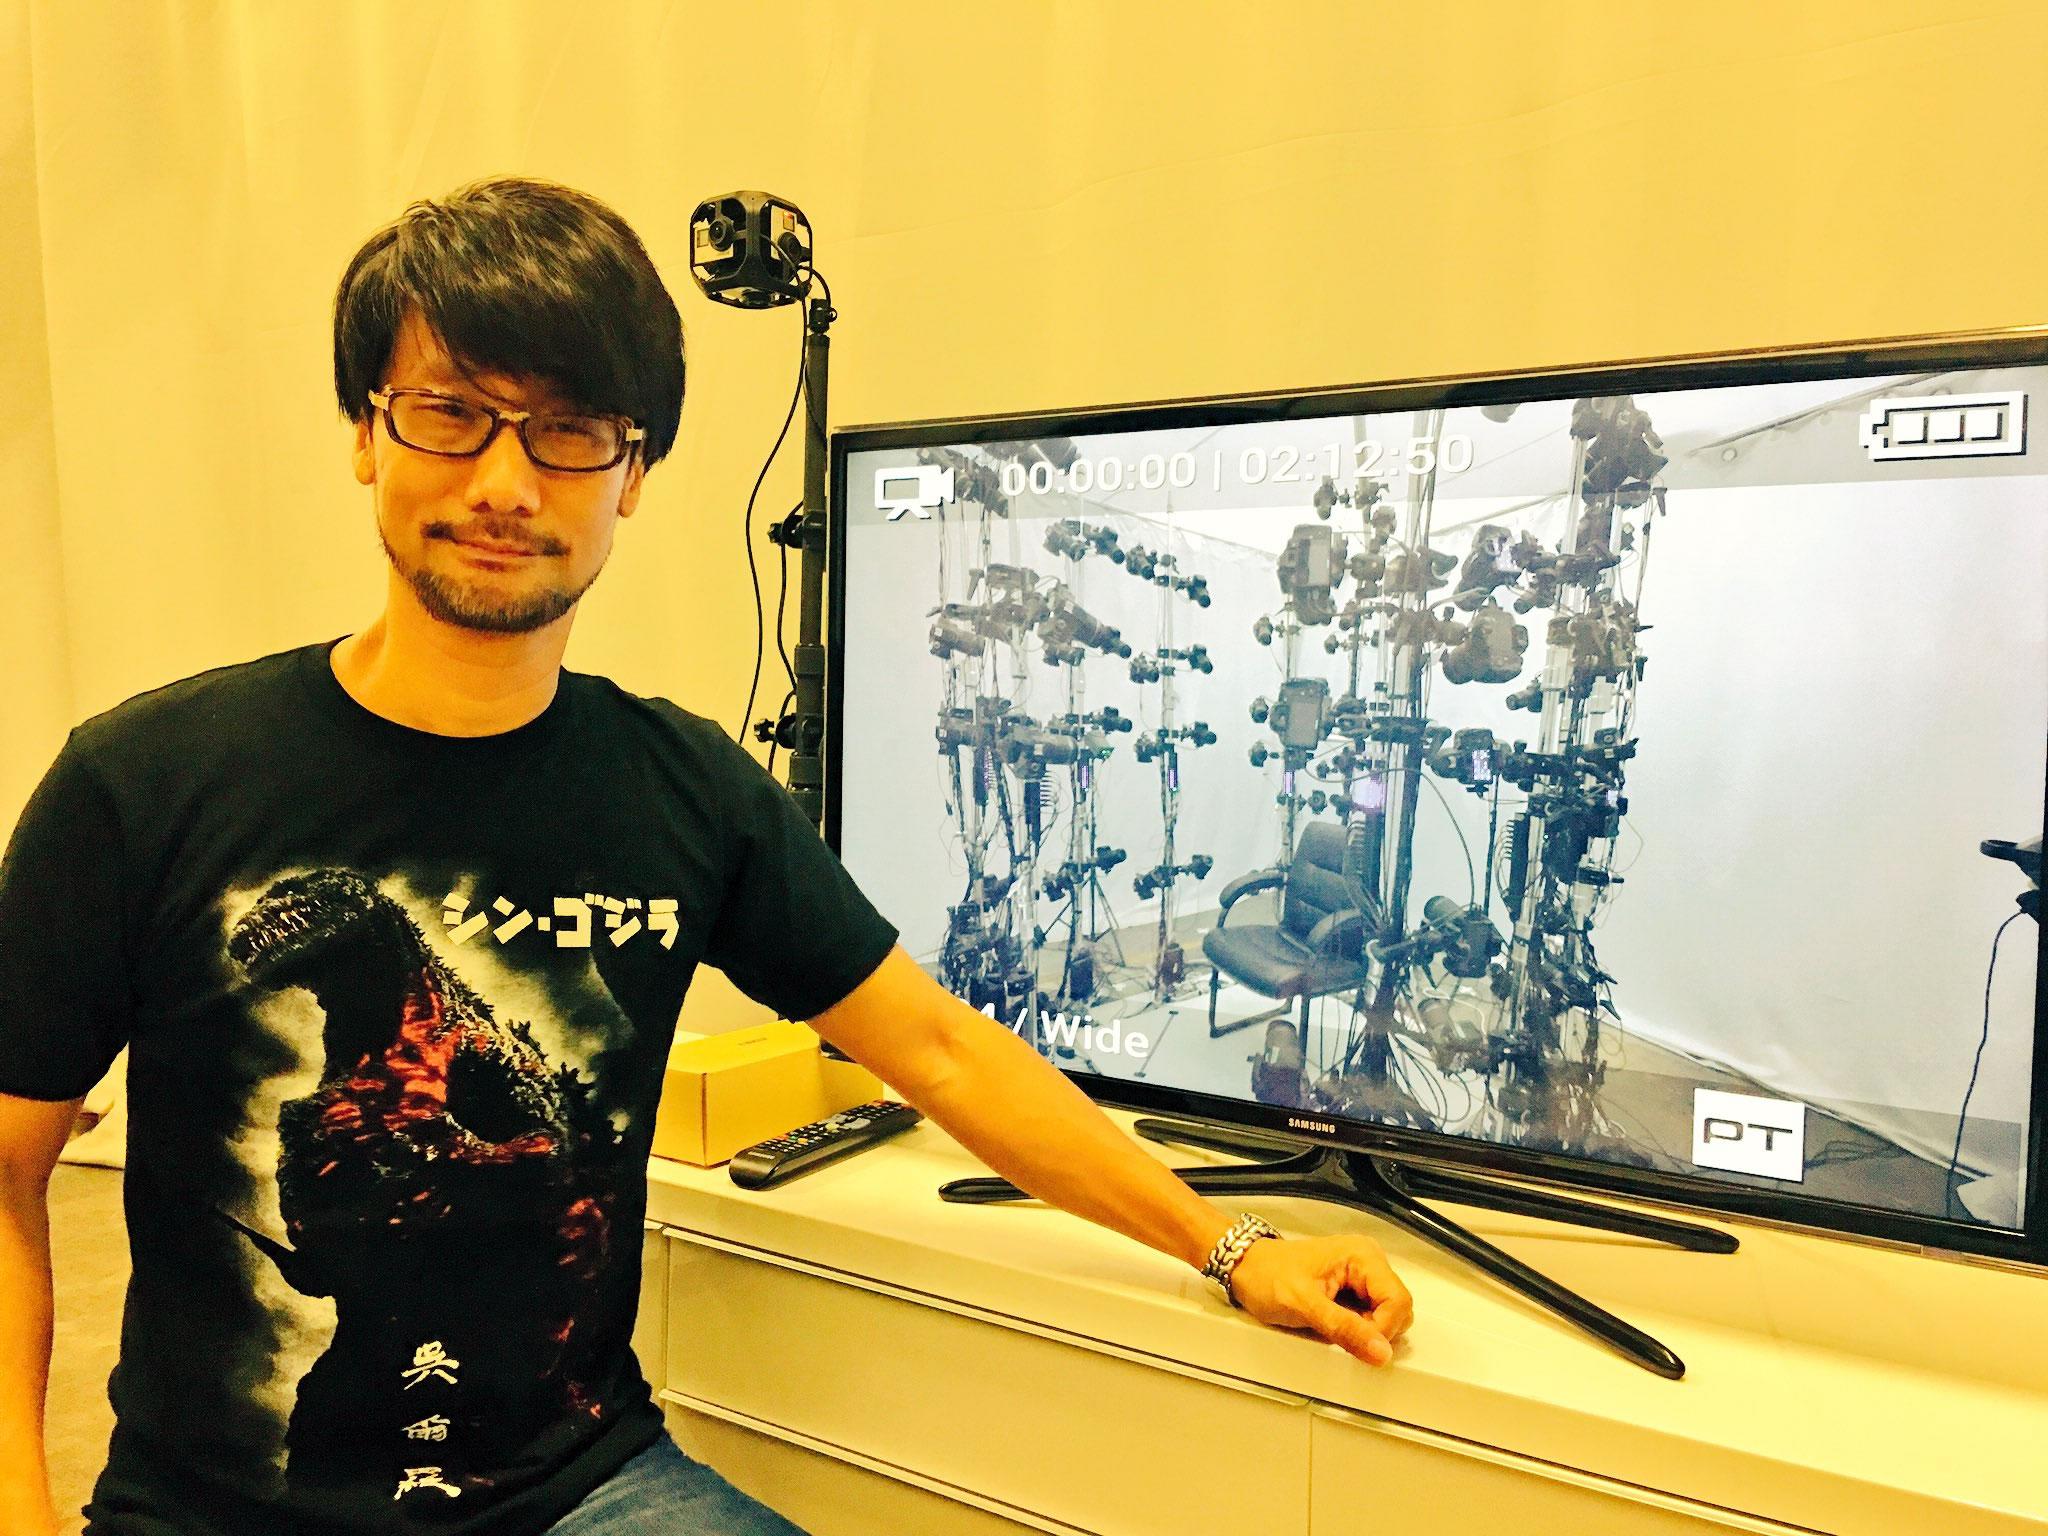 « Hideo Kojima, aujourd'hui. » – Ayako Terashima, le 11 septembre 2016